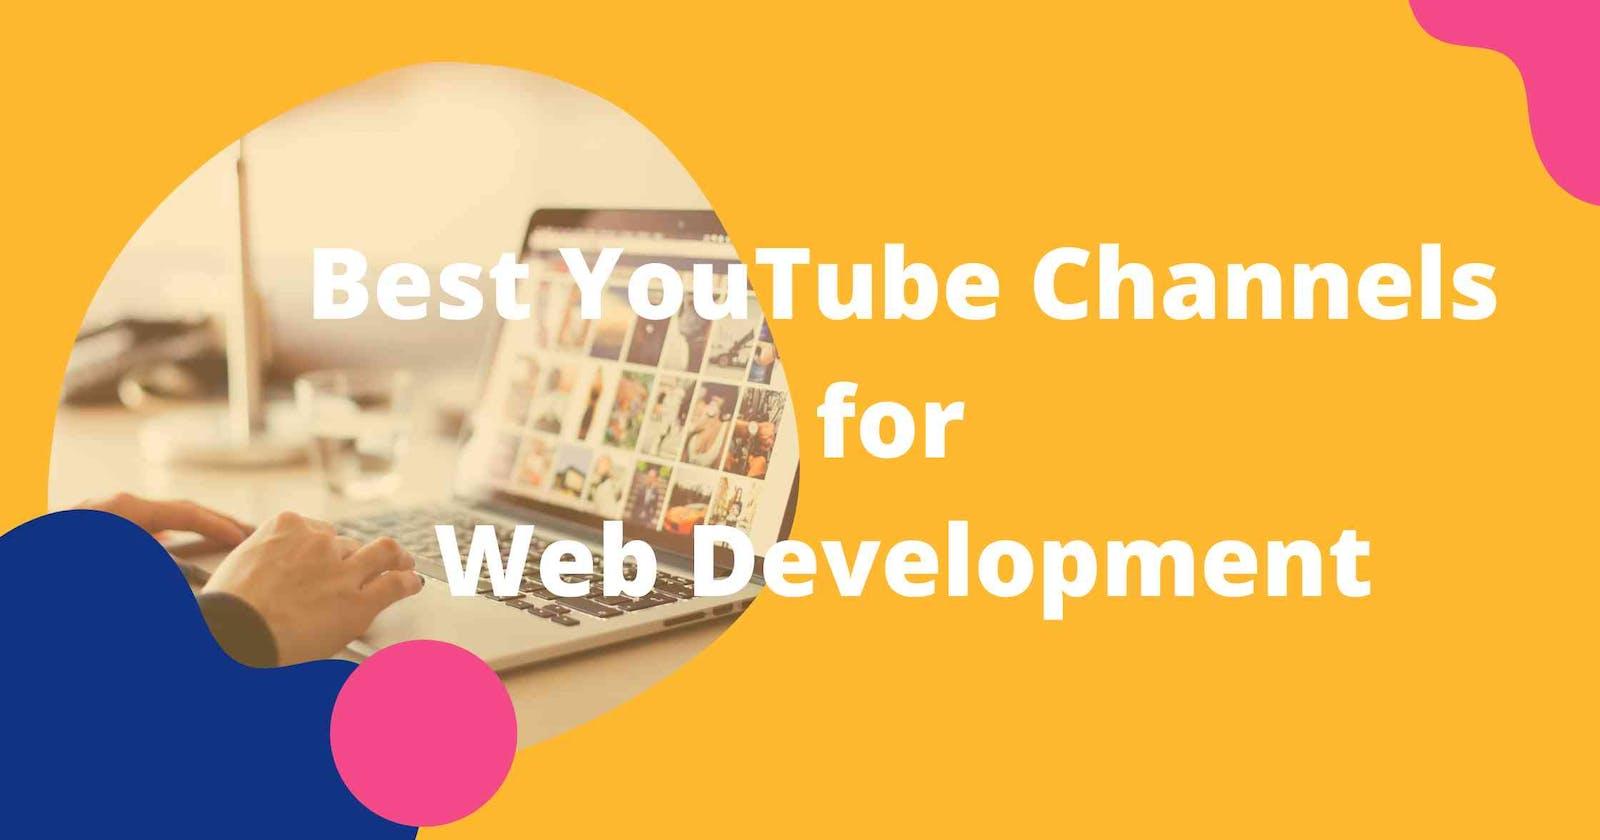 Top 10 Youtube Channels To Learn Web Development